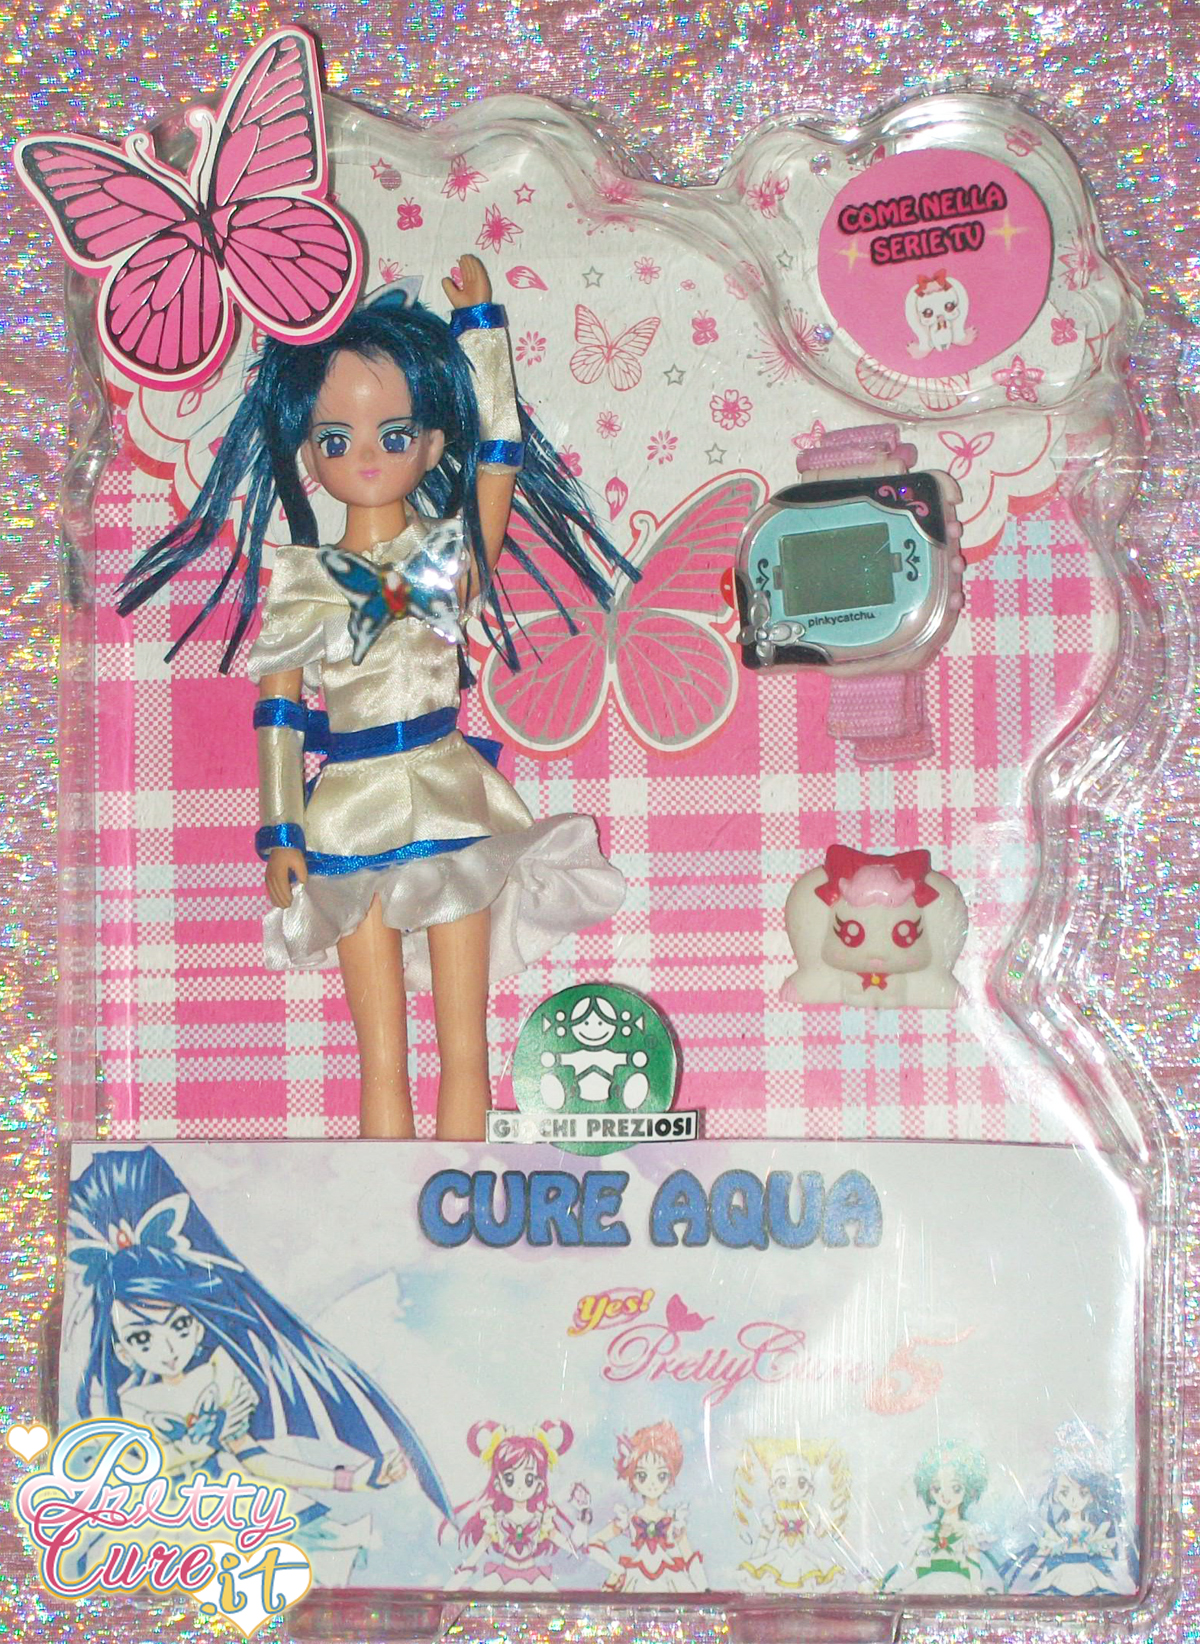 yes-pretty-cure-5-bambola-doll-aqua-custom-ooak-handmade-giochi-preziosi-stile-pinky-catch-coco-rai-backstage-trade-licensing